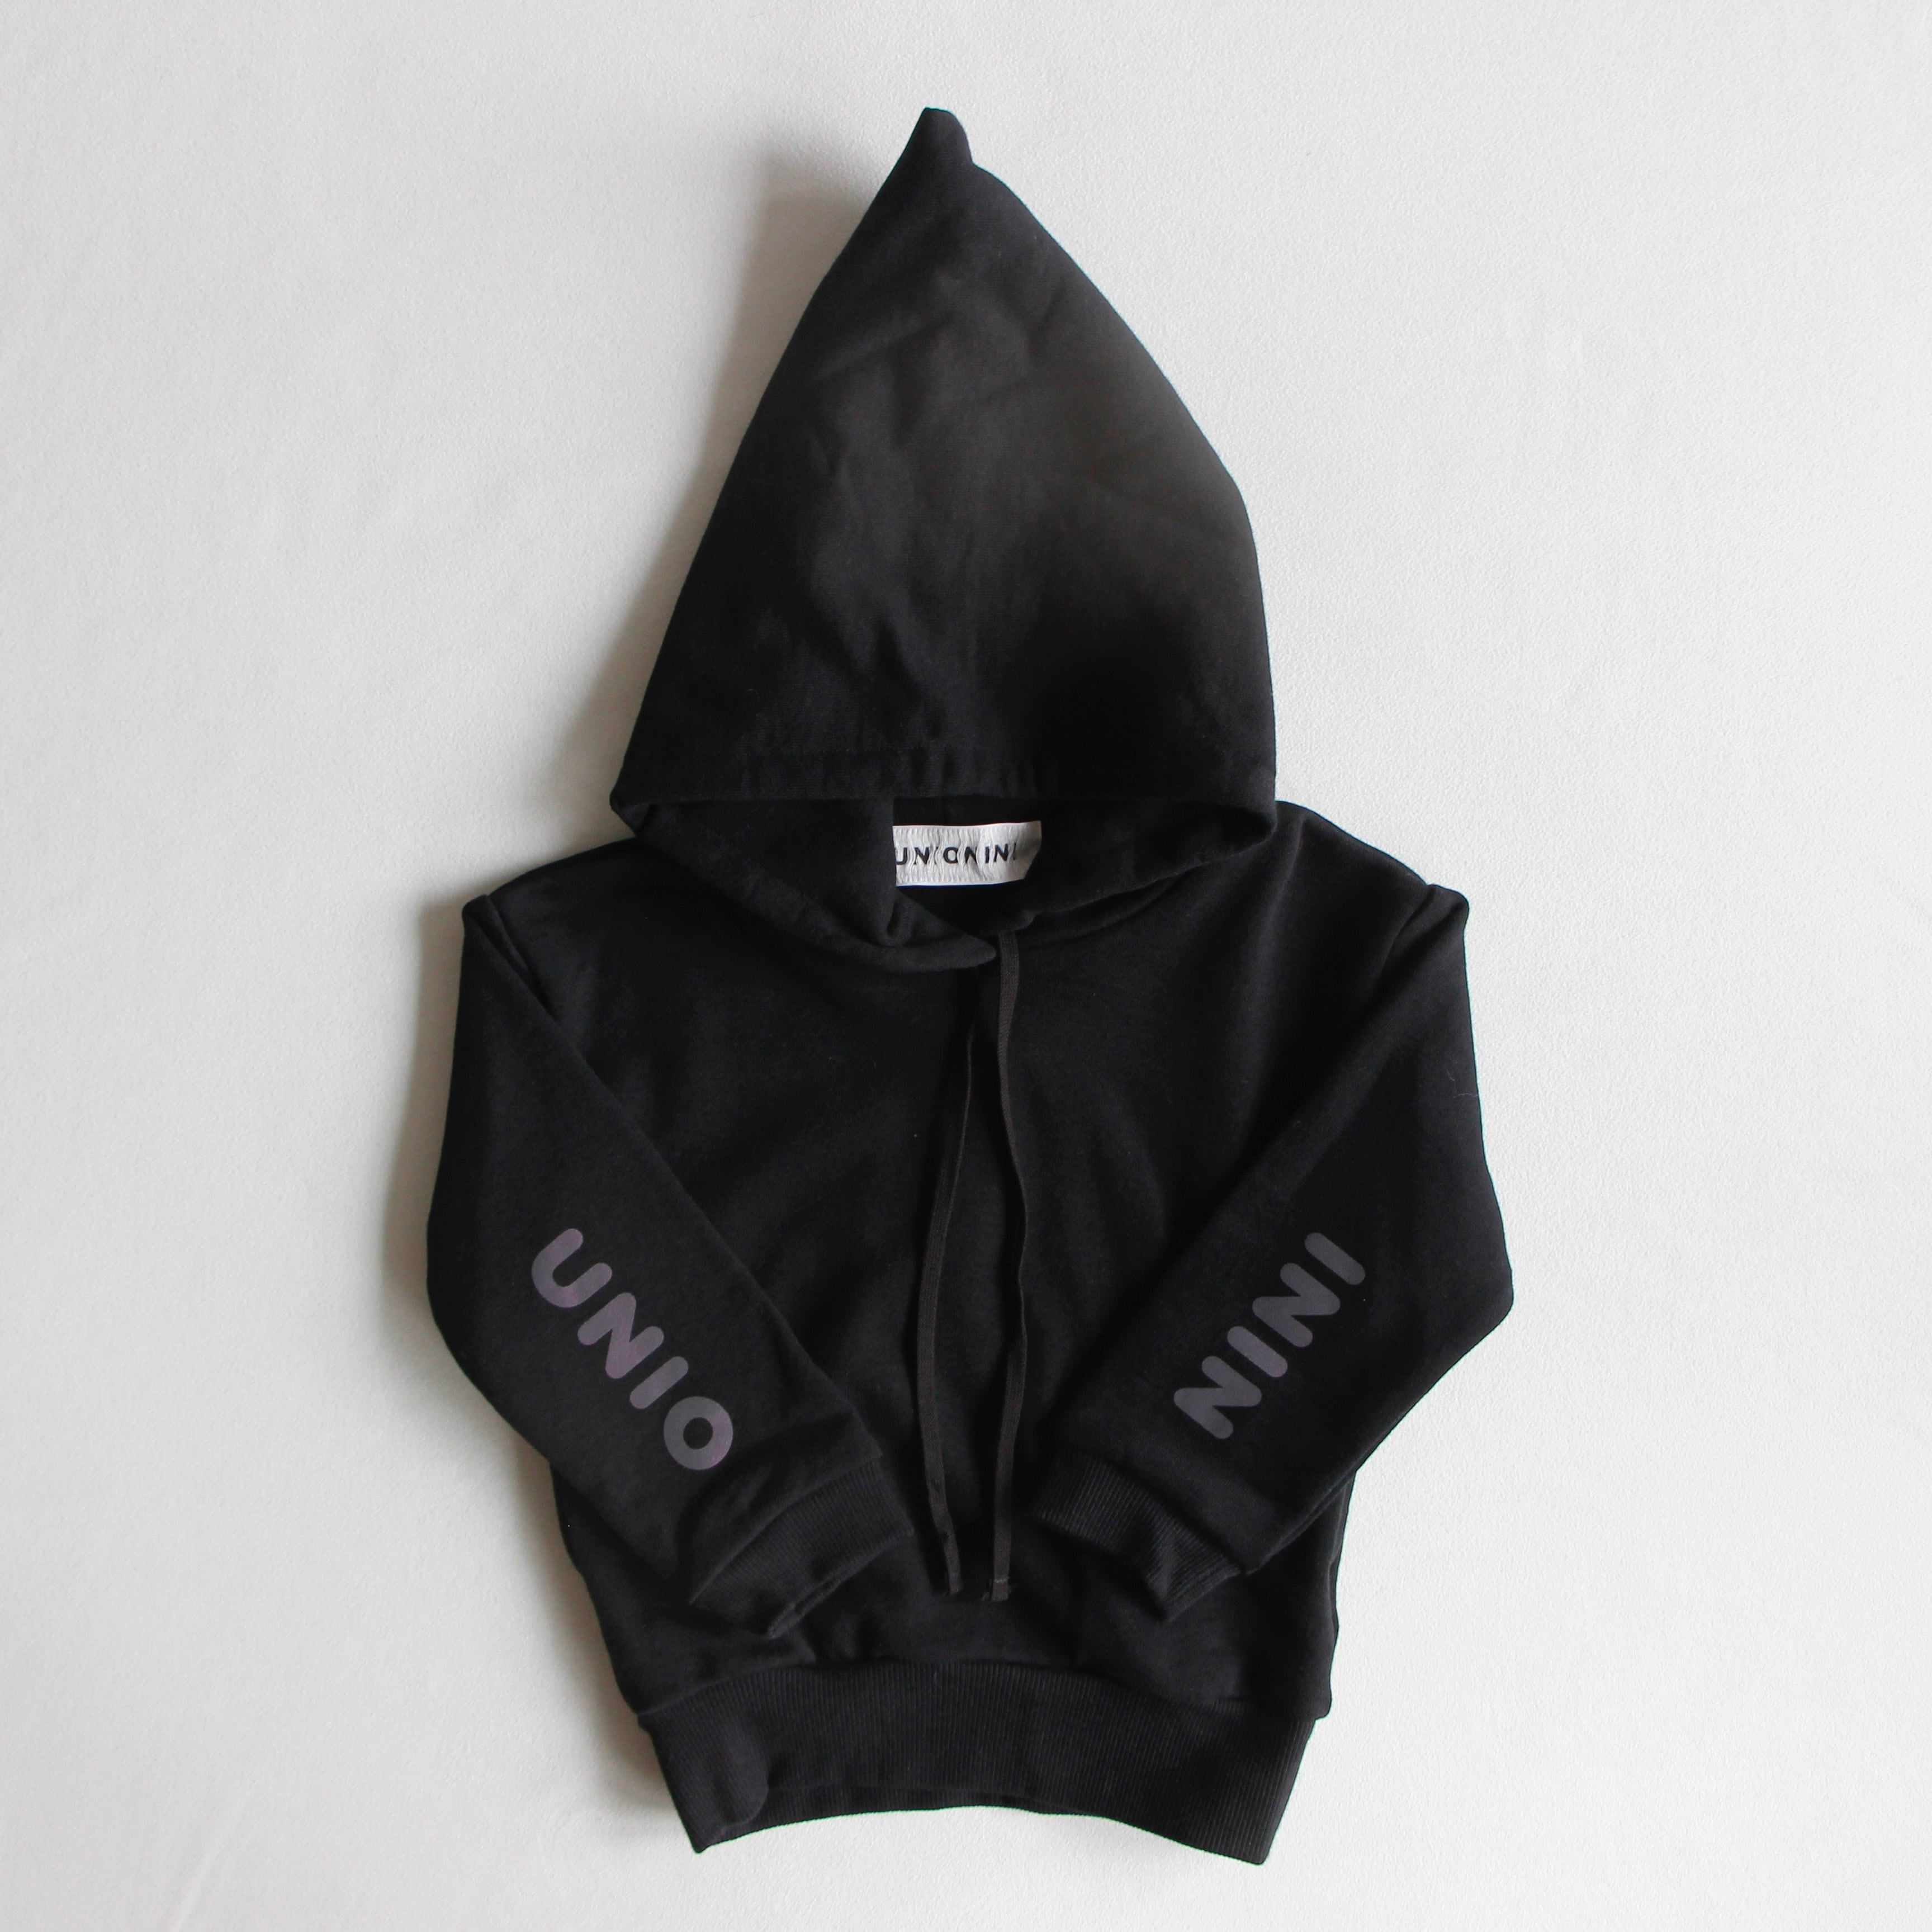 《UNIONINI 2021AW》reflect logo hoodie / black